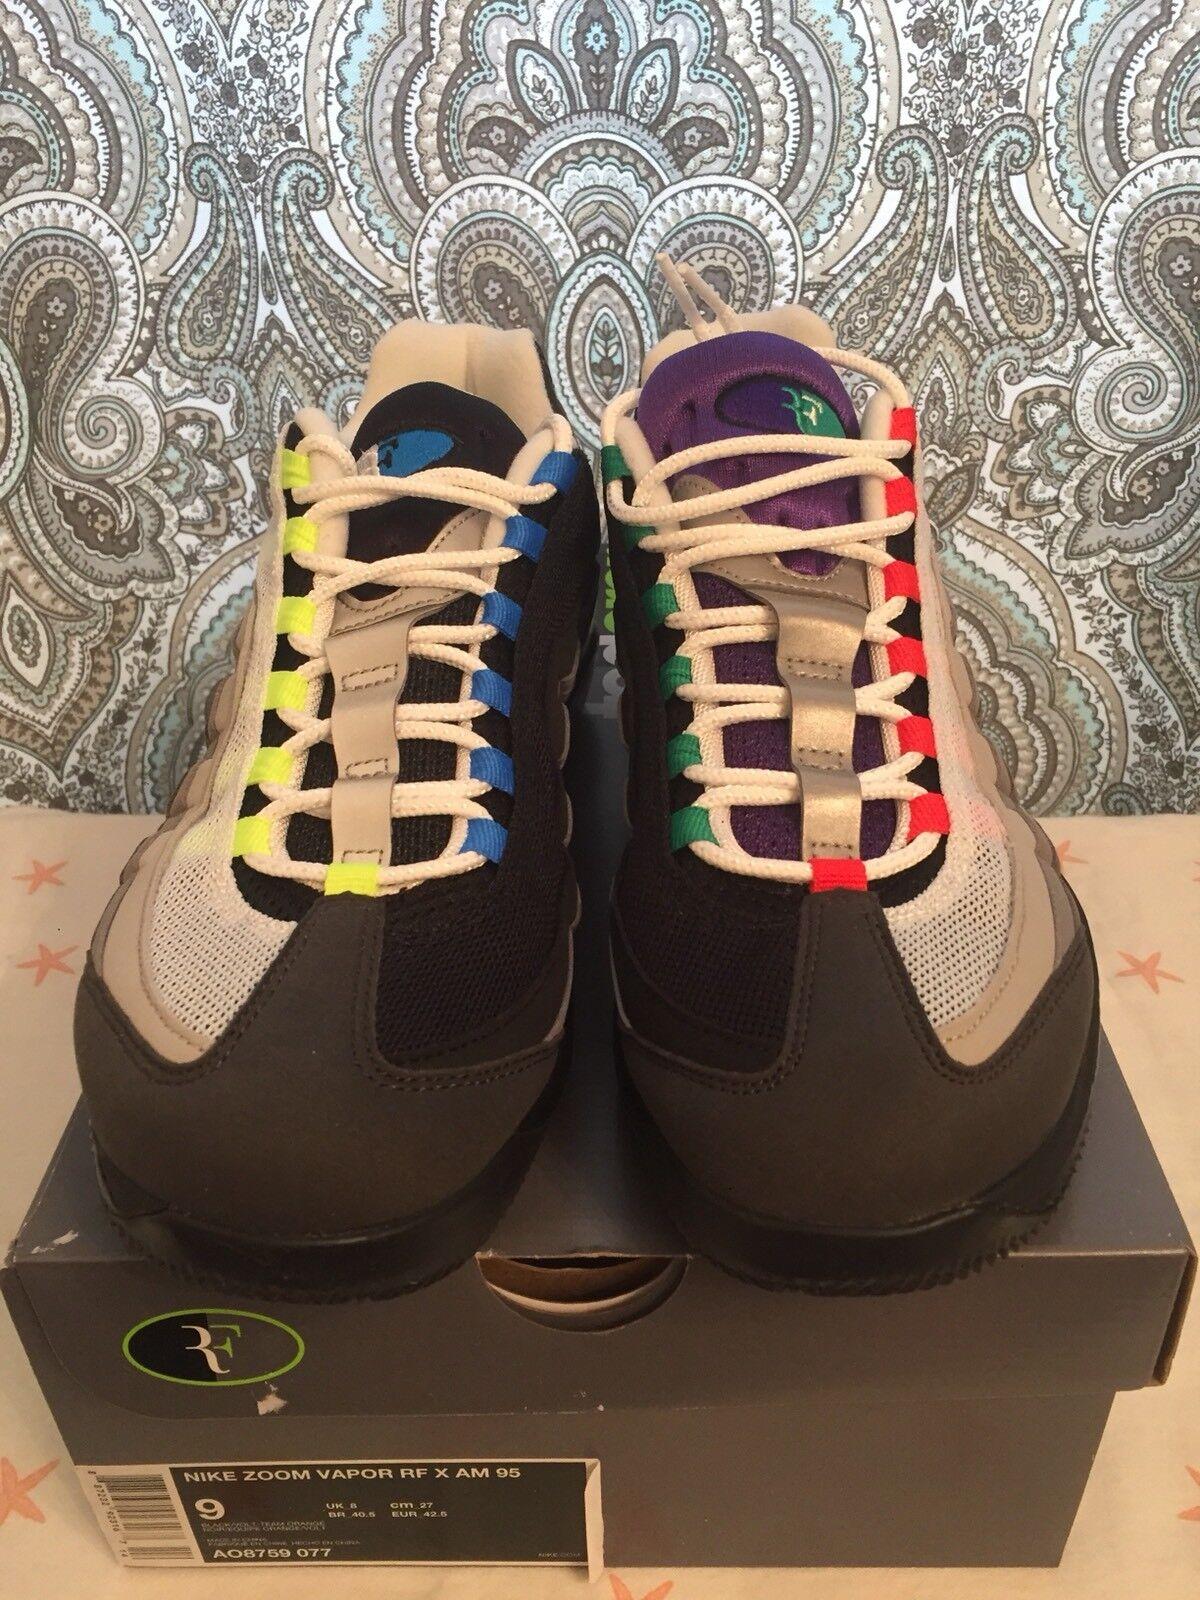 Nike Zoom Vapor RF x AM 95 Black Volt Team Orange Greedy AO8759 077 Sz 9 Seasonal clearance sale